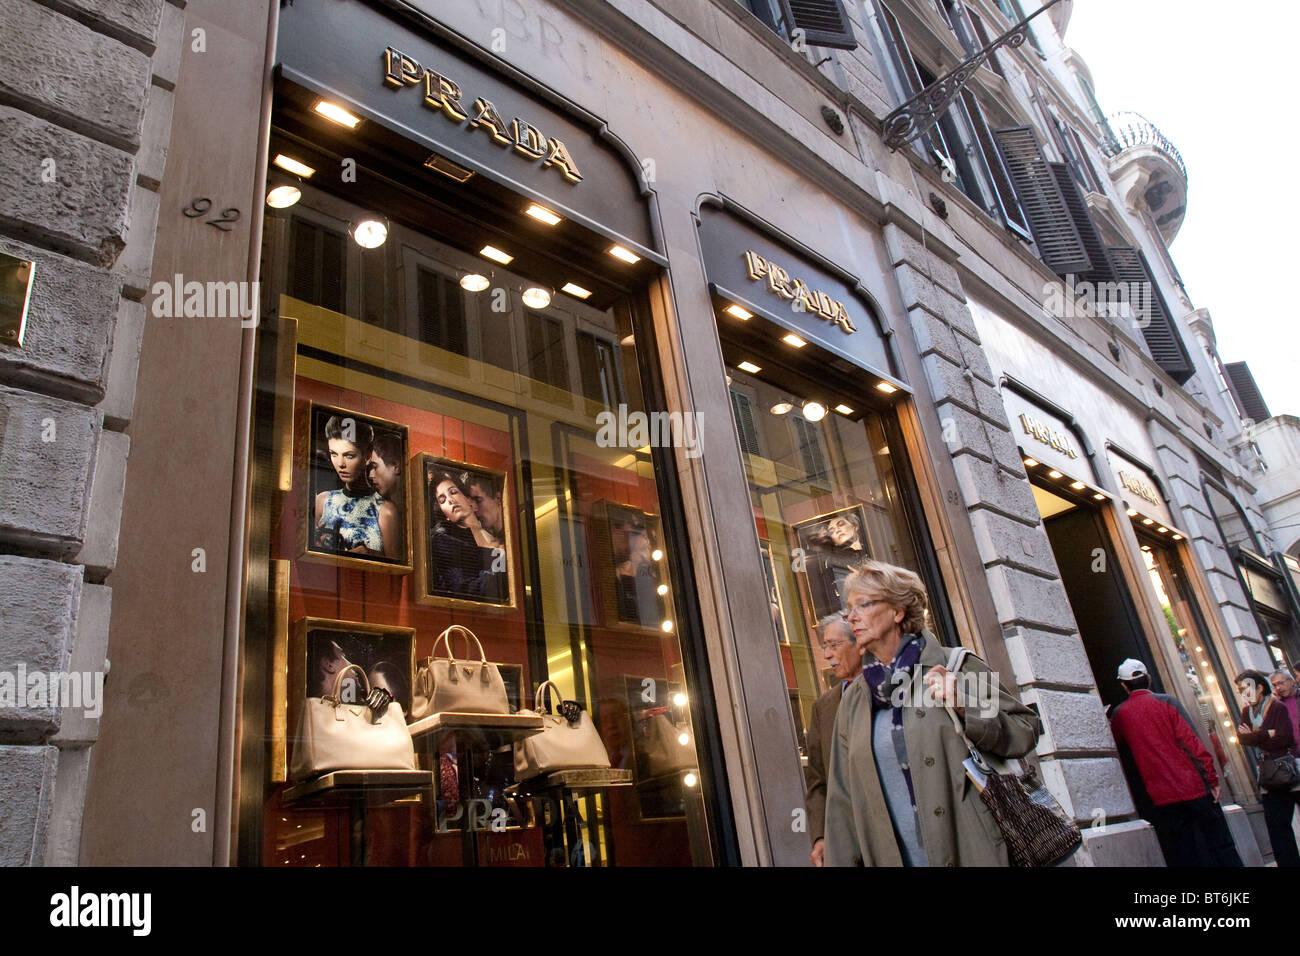 via dei Condotti Prada fashion shop shopping Rome street store shop window  entrance fashion accessories - 7e92daf5df4